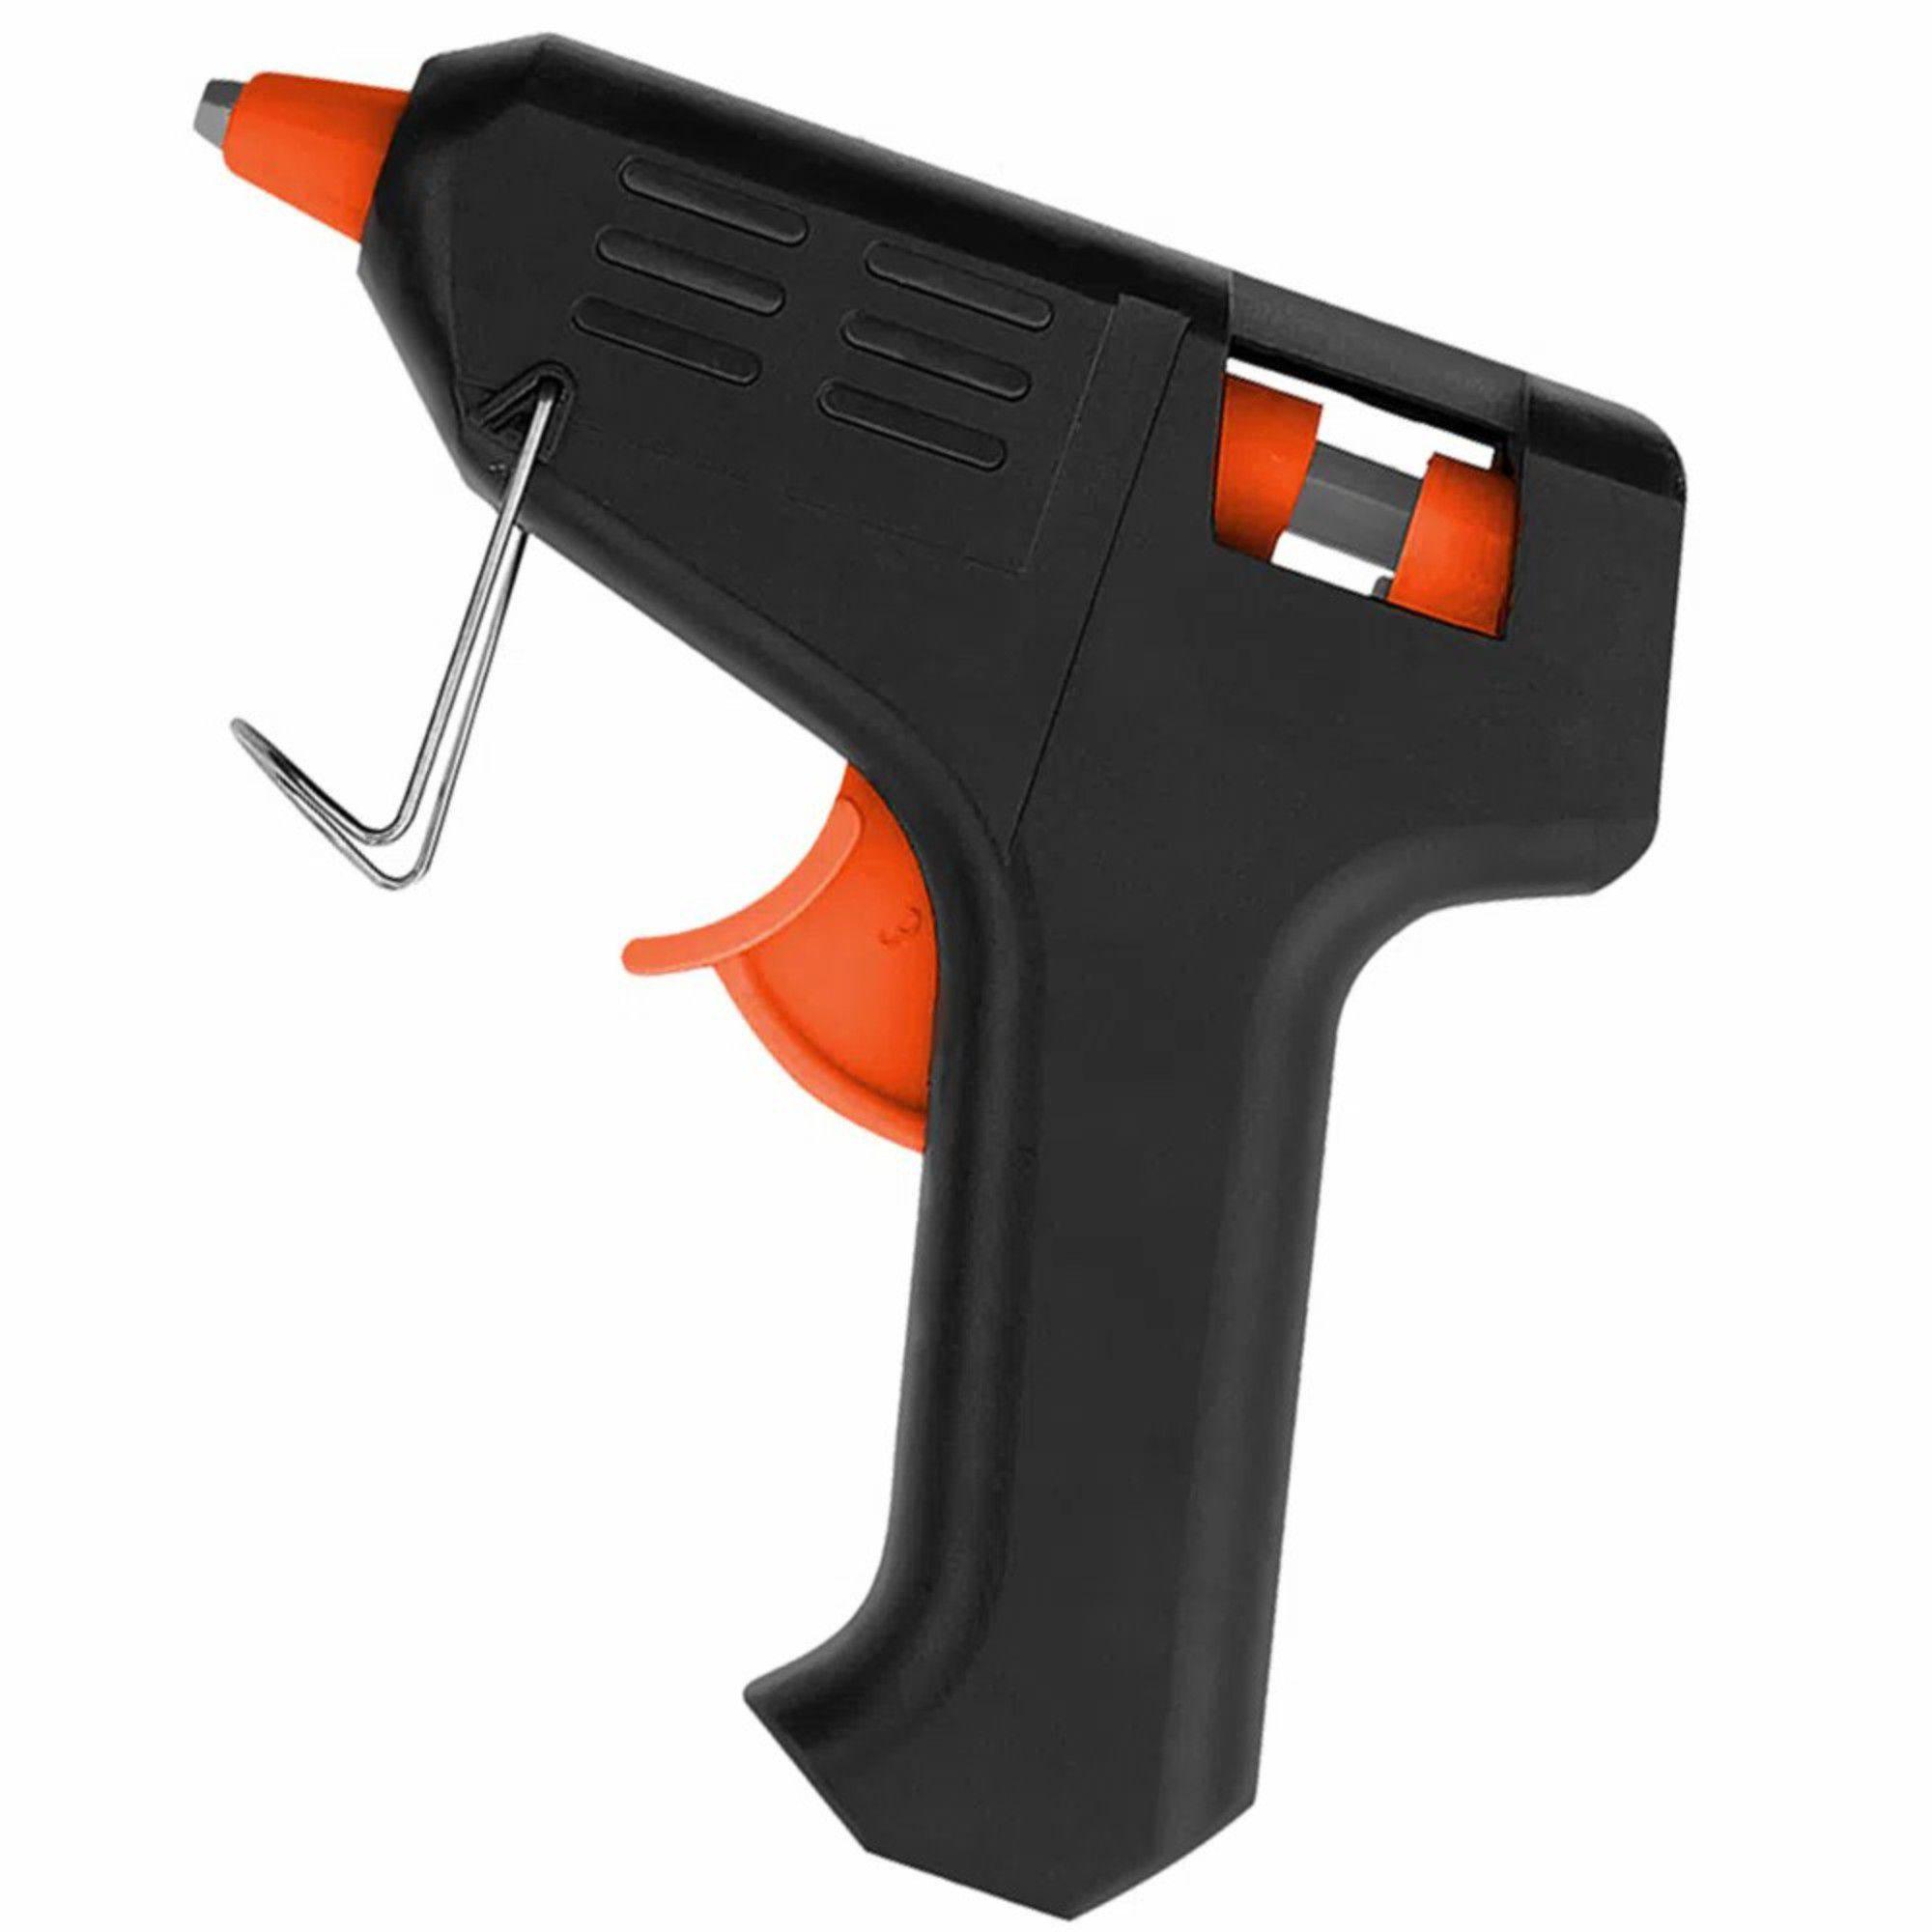 Pistola De Cola Quente Profissional Grande 40w Bi-Volt 11 Mm